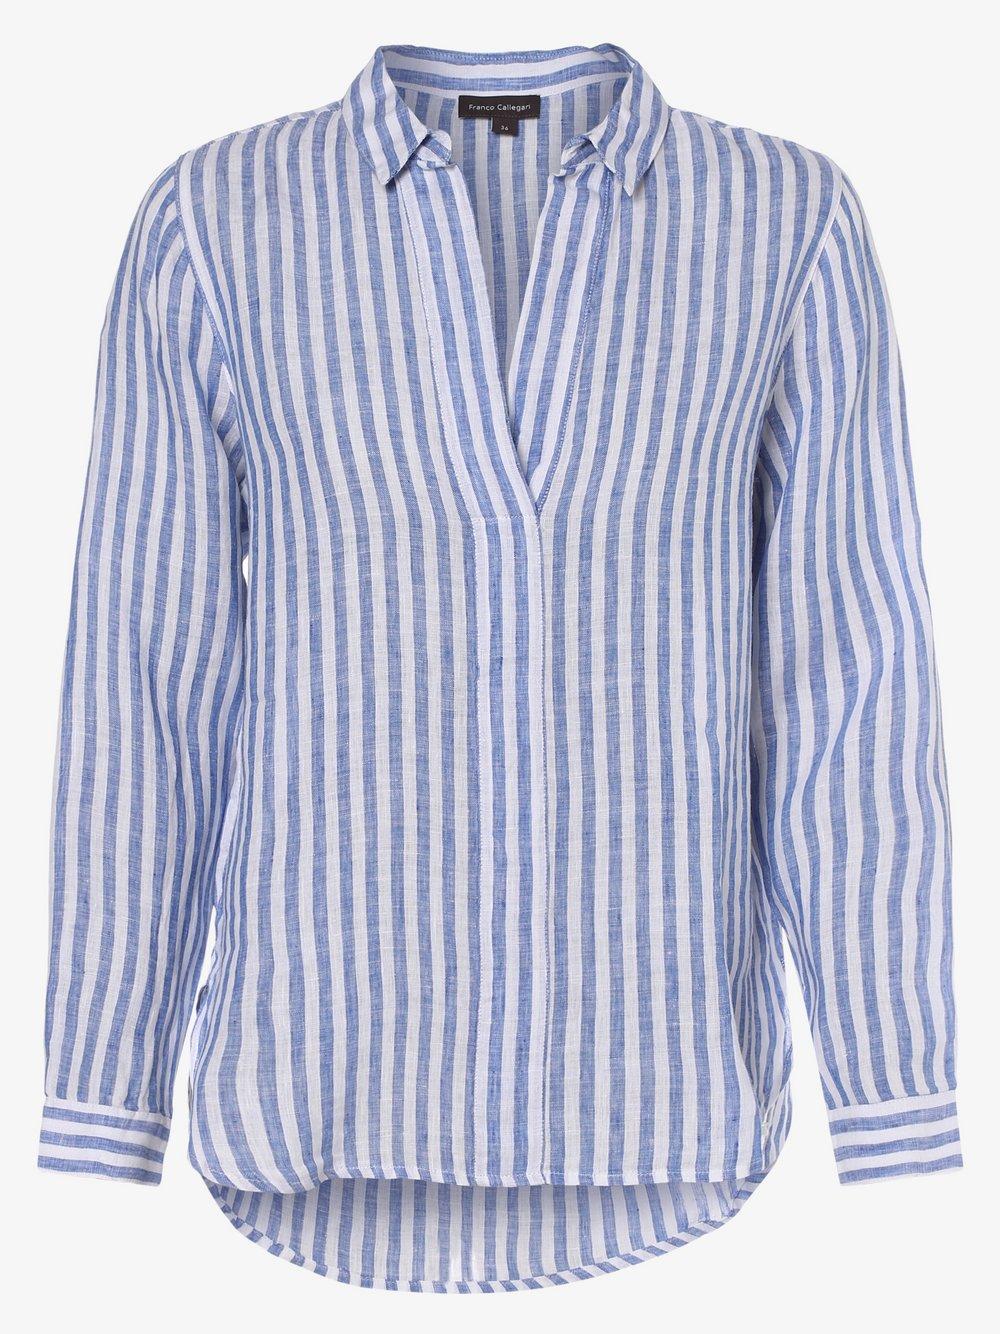 Franco Callegari - Damska bluzka lniana, niebieski